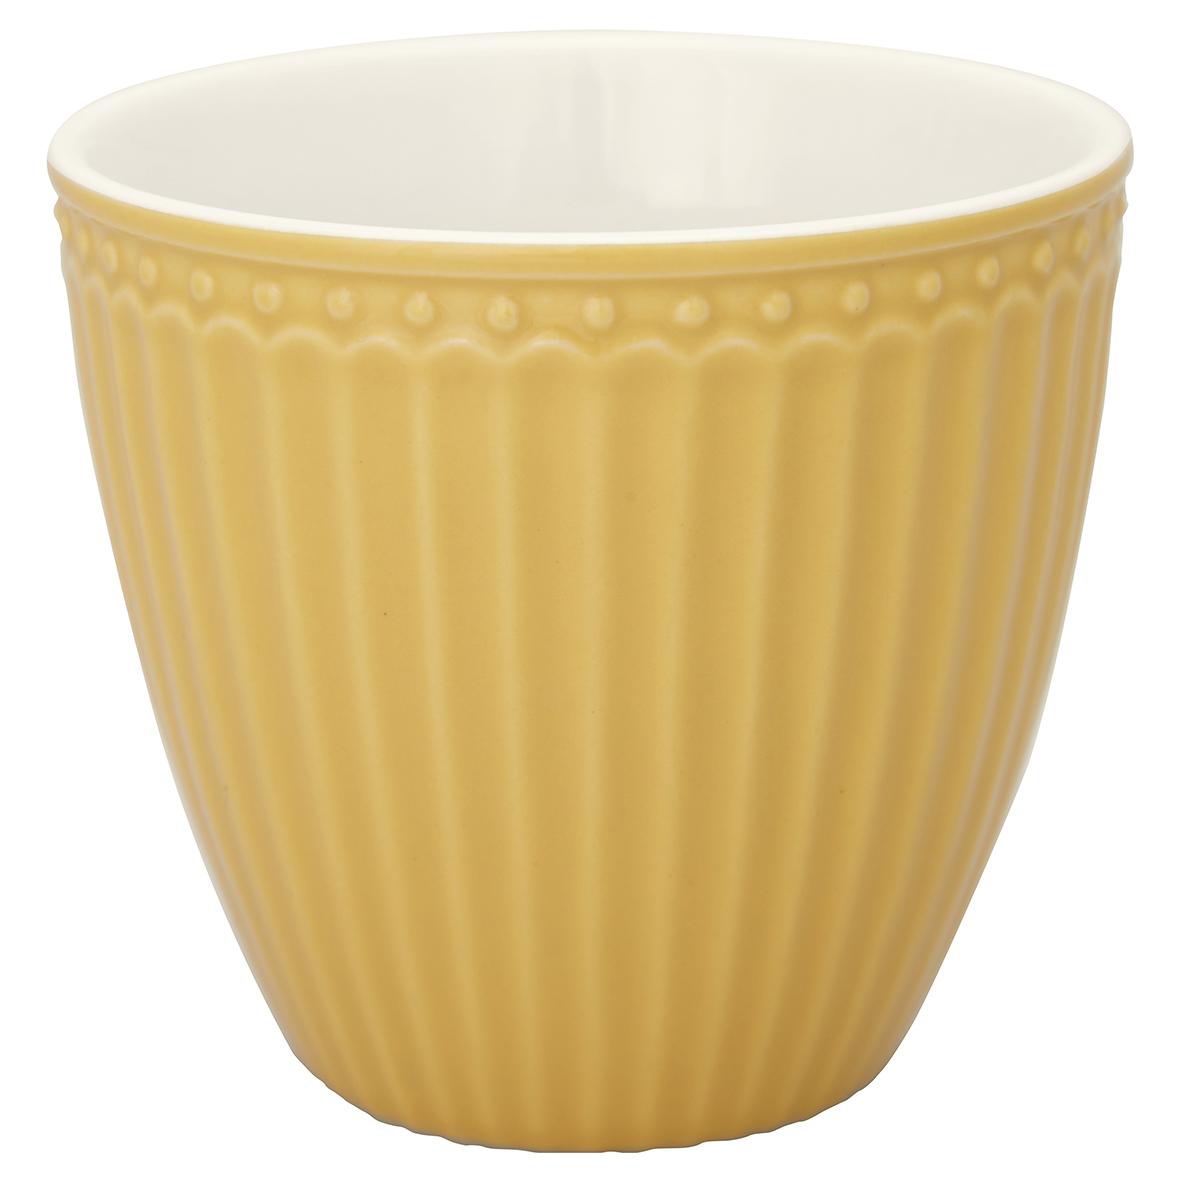 Greengate Lattecup Alice Honey mustard Everyday Kollektion